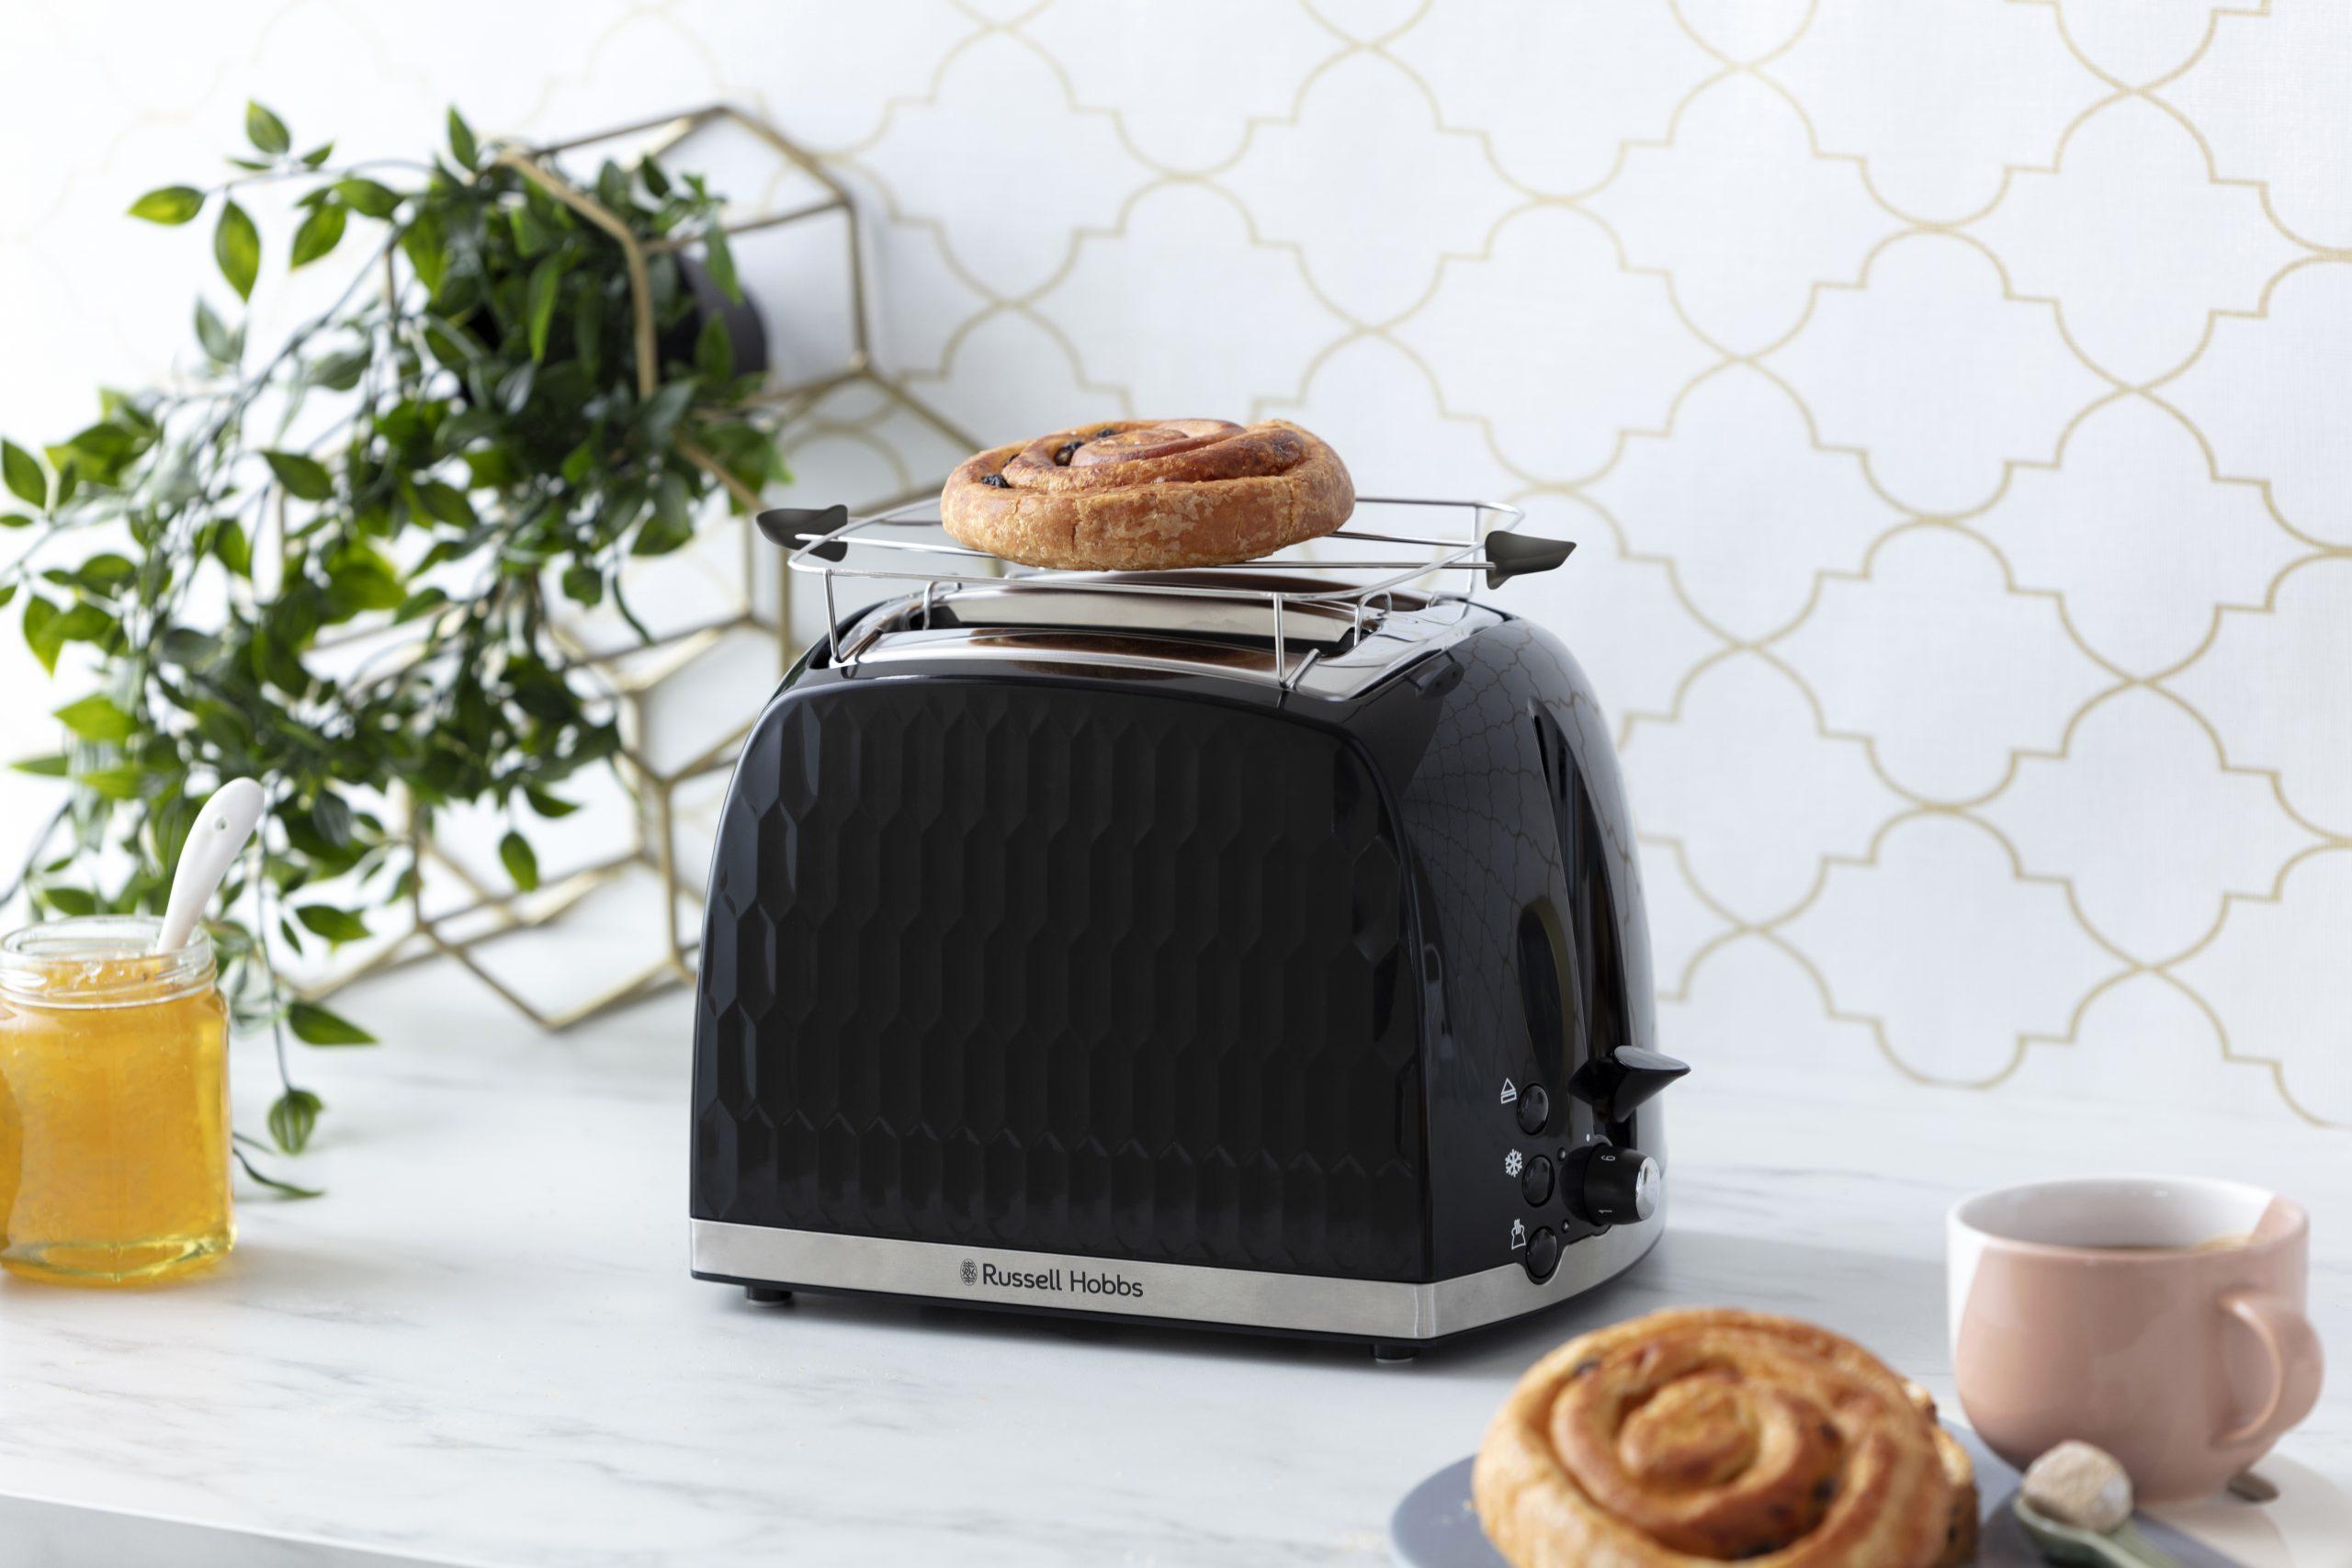 Russell Hobbs Honeycomb Toaster. Foto: Russell Hobbs